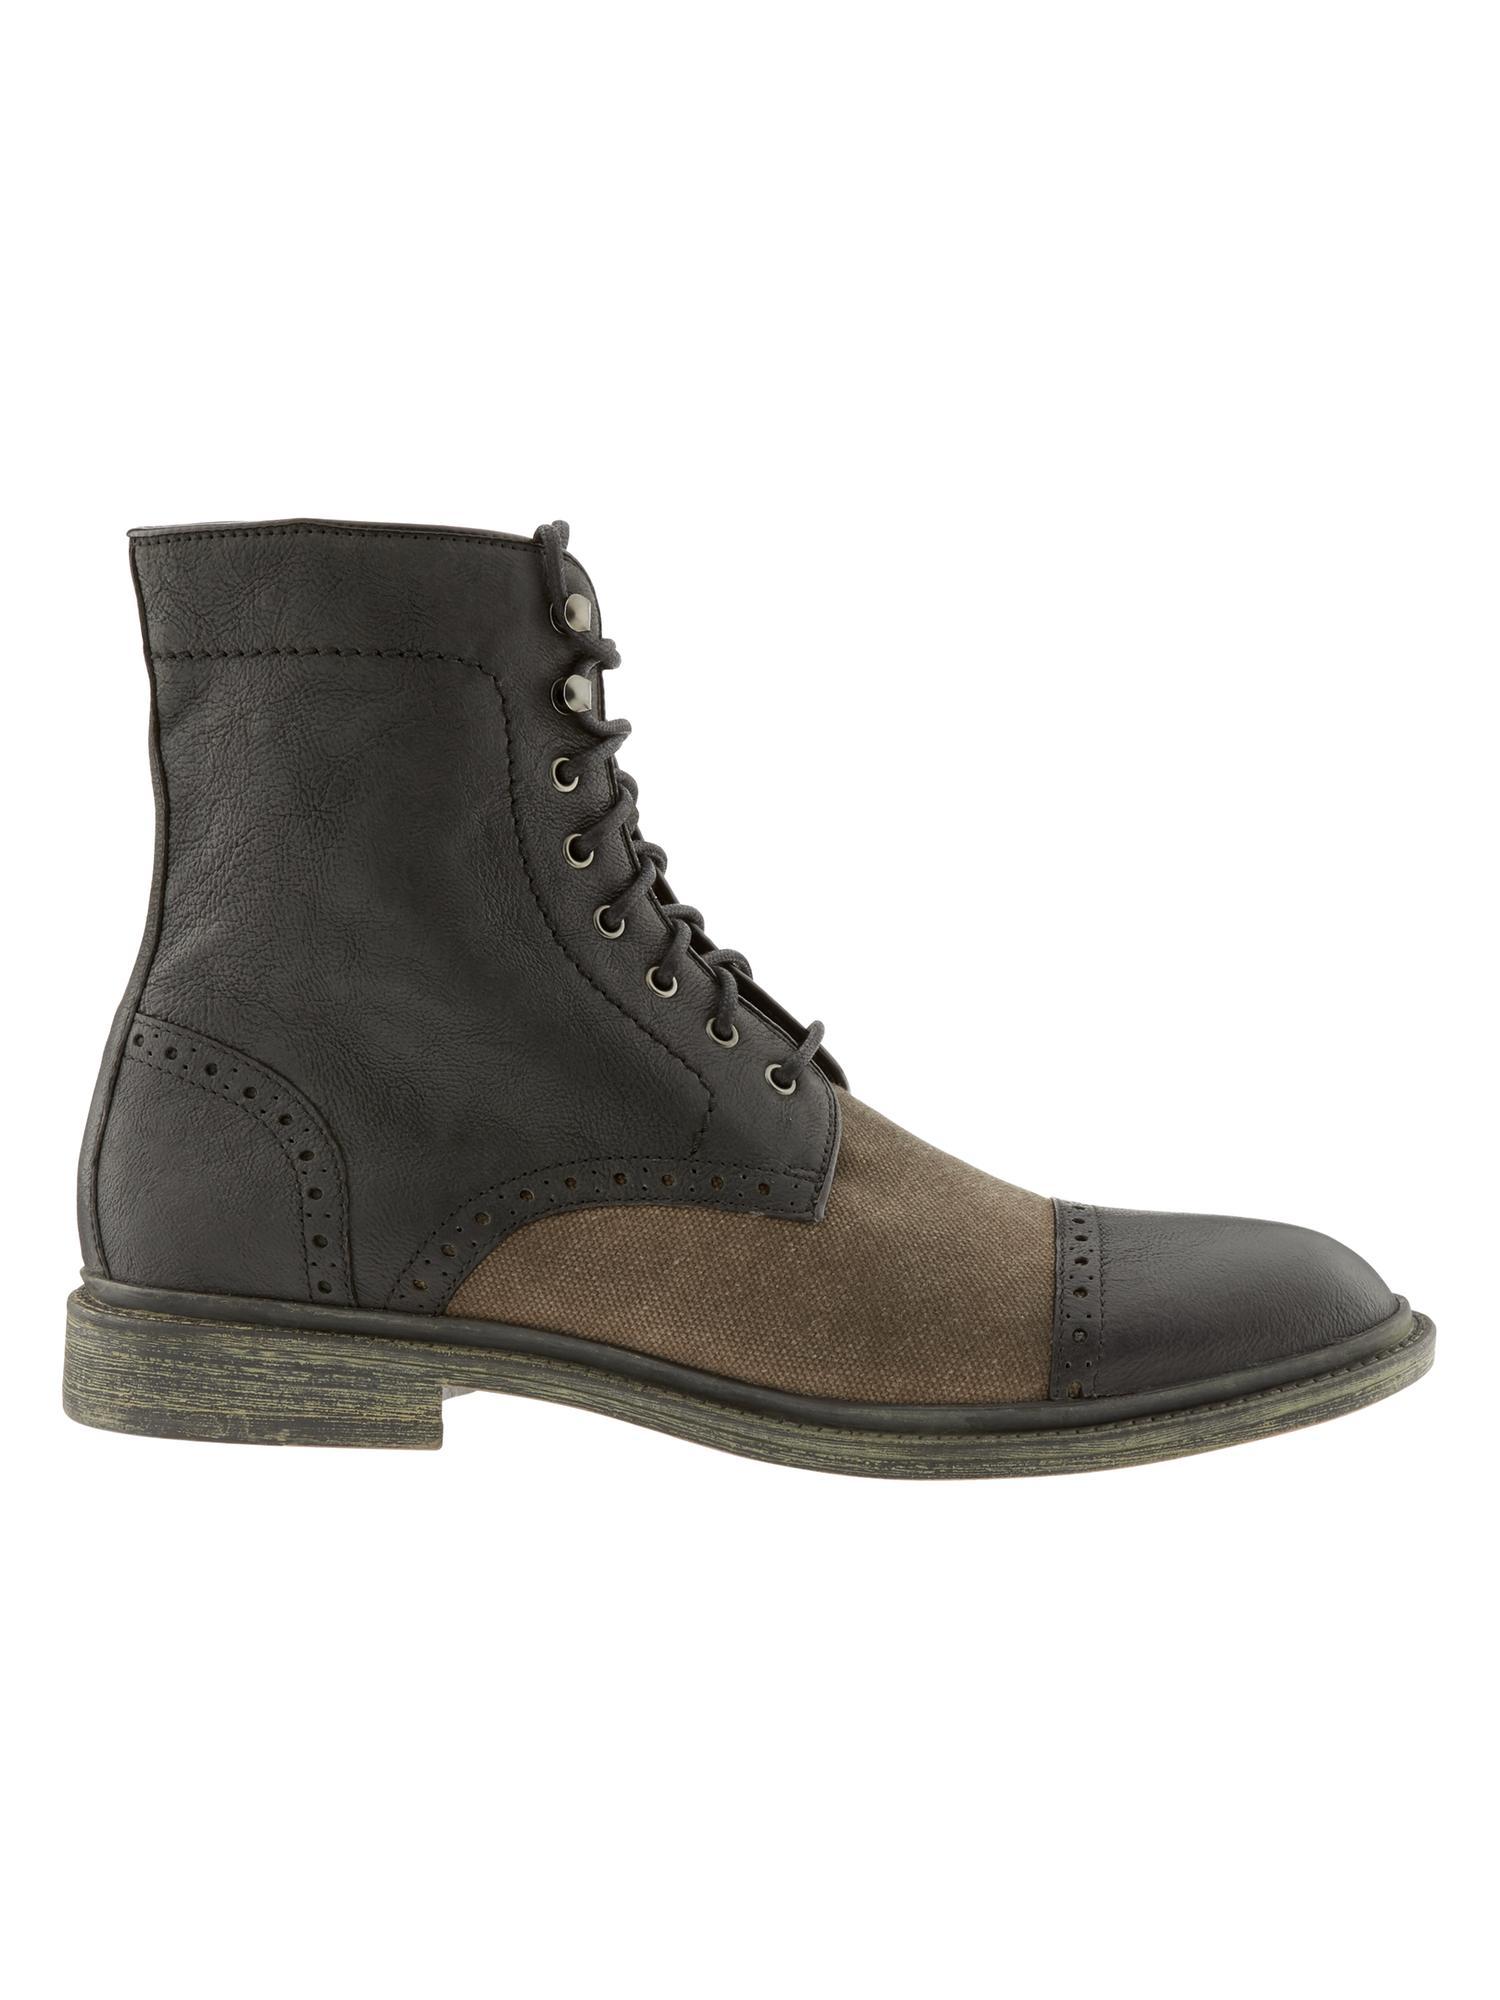 banana republic maxwell boot in gray for grey